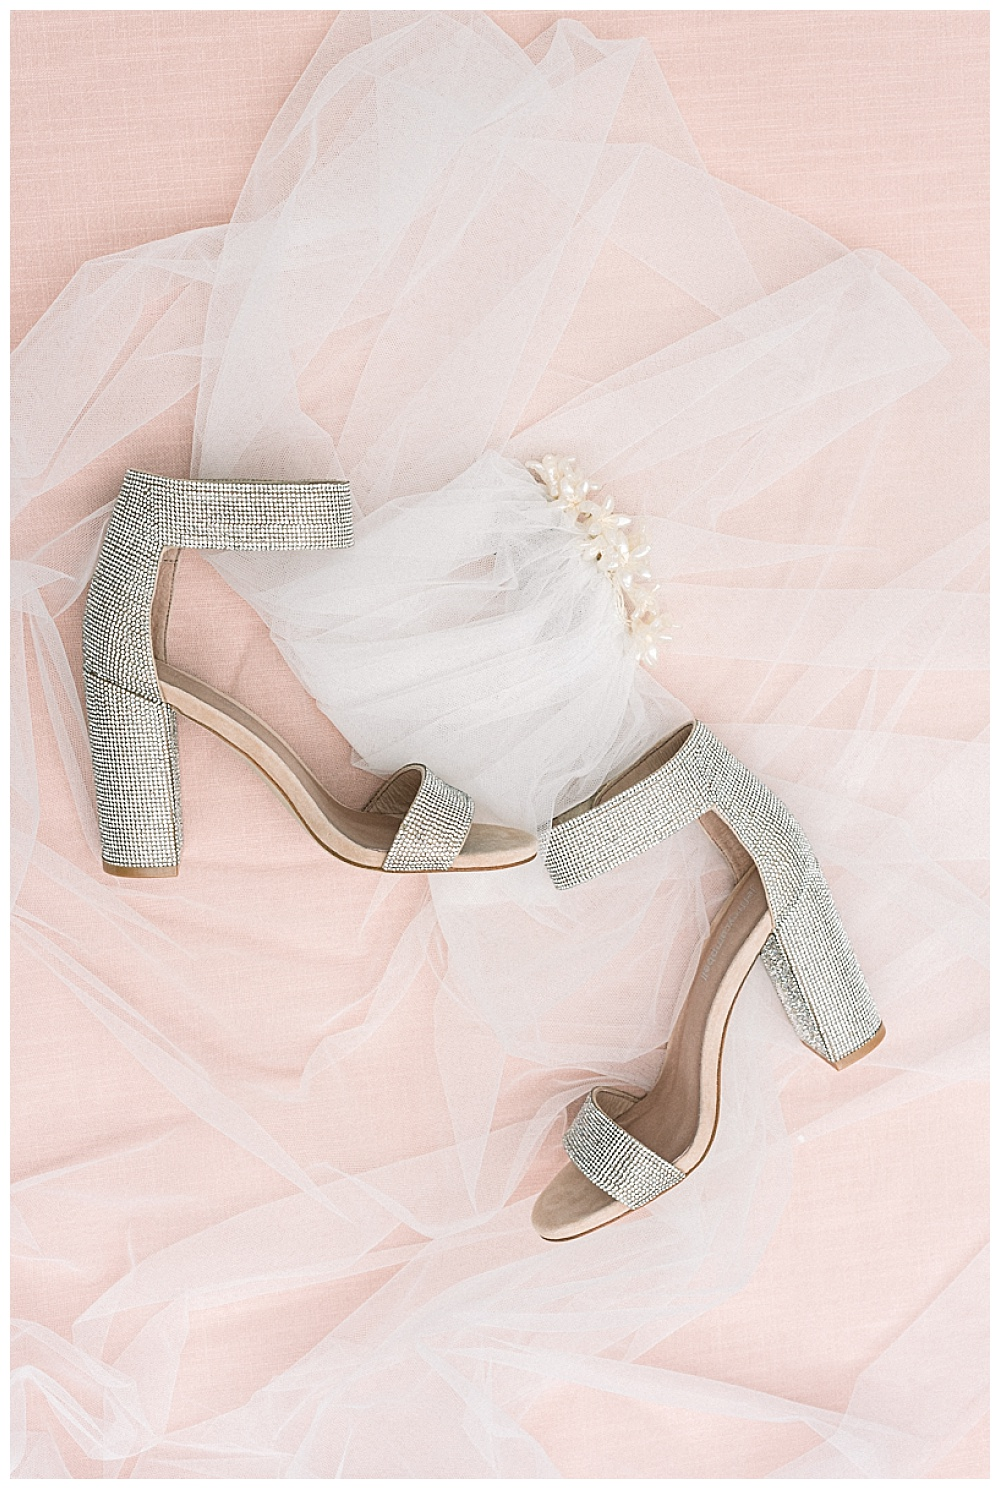 sparkly wedding shoes on blush background, waverley country club portland oregon